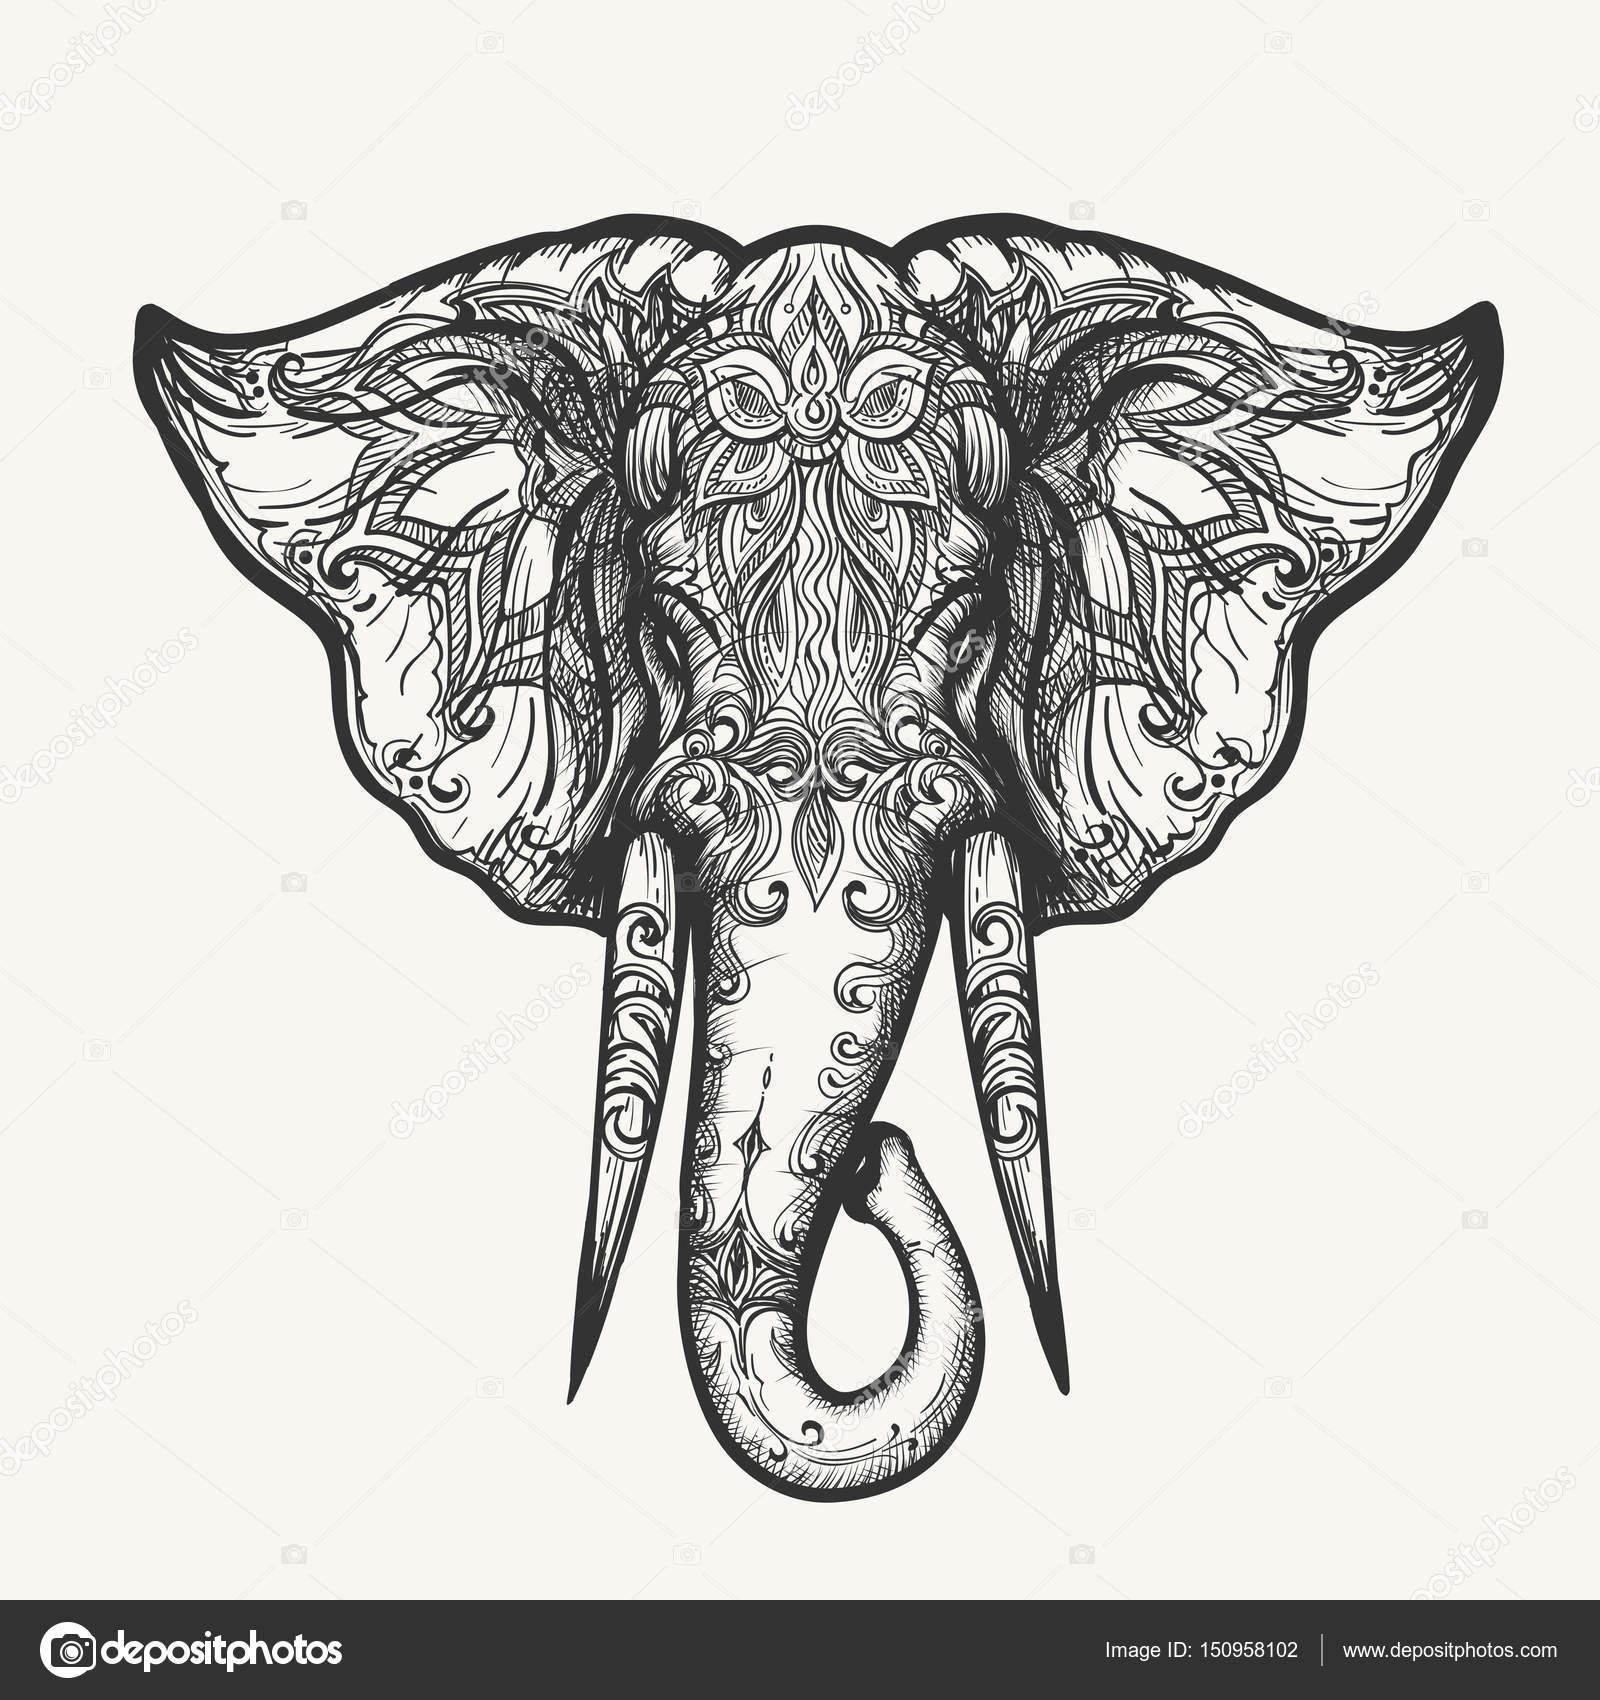 Elefant Kopf Zentangle Illustration — Stockvektor © bogadeva #150958102